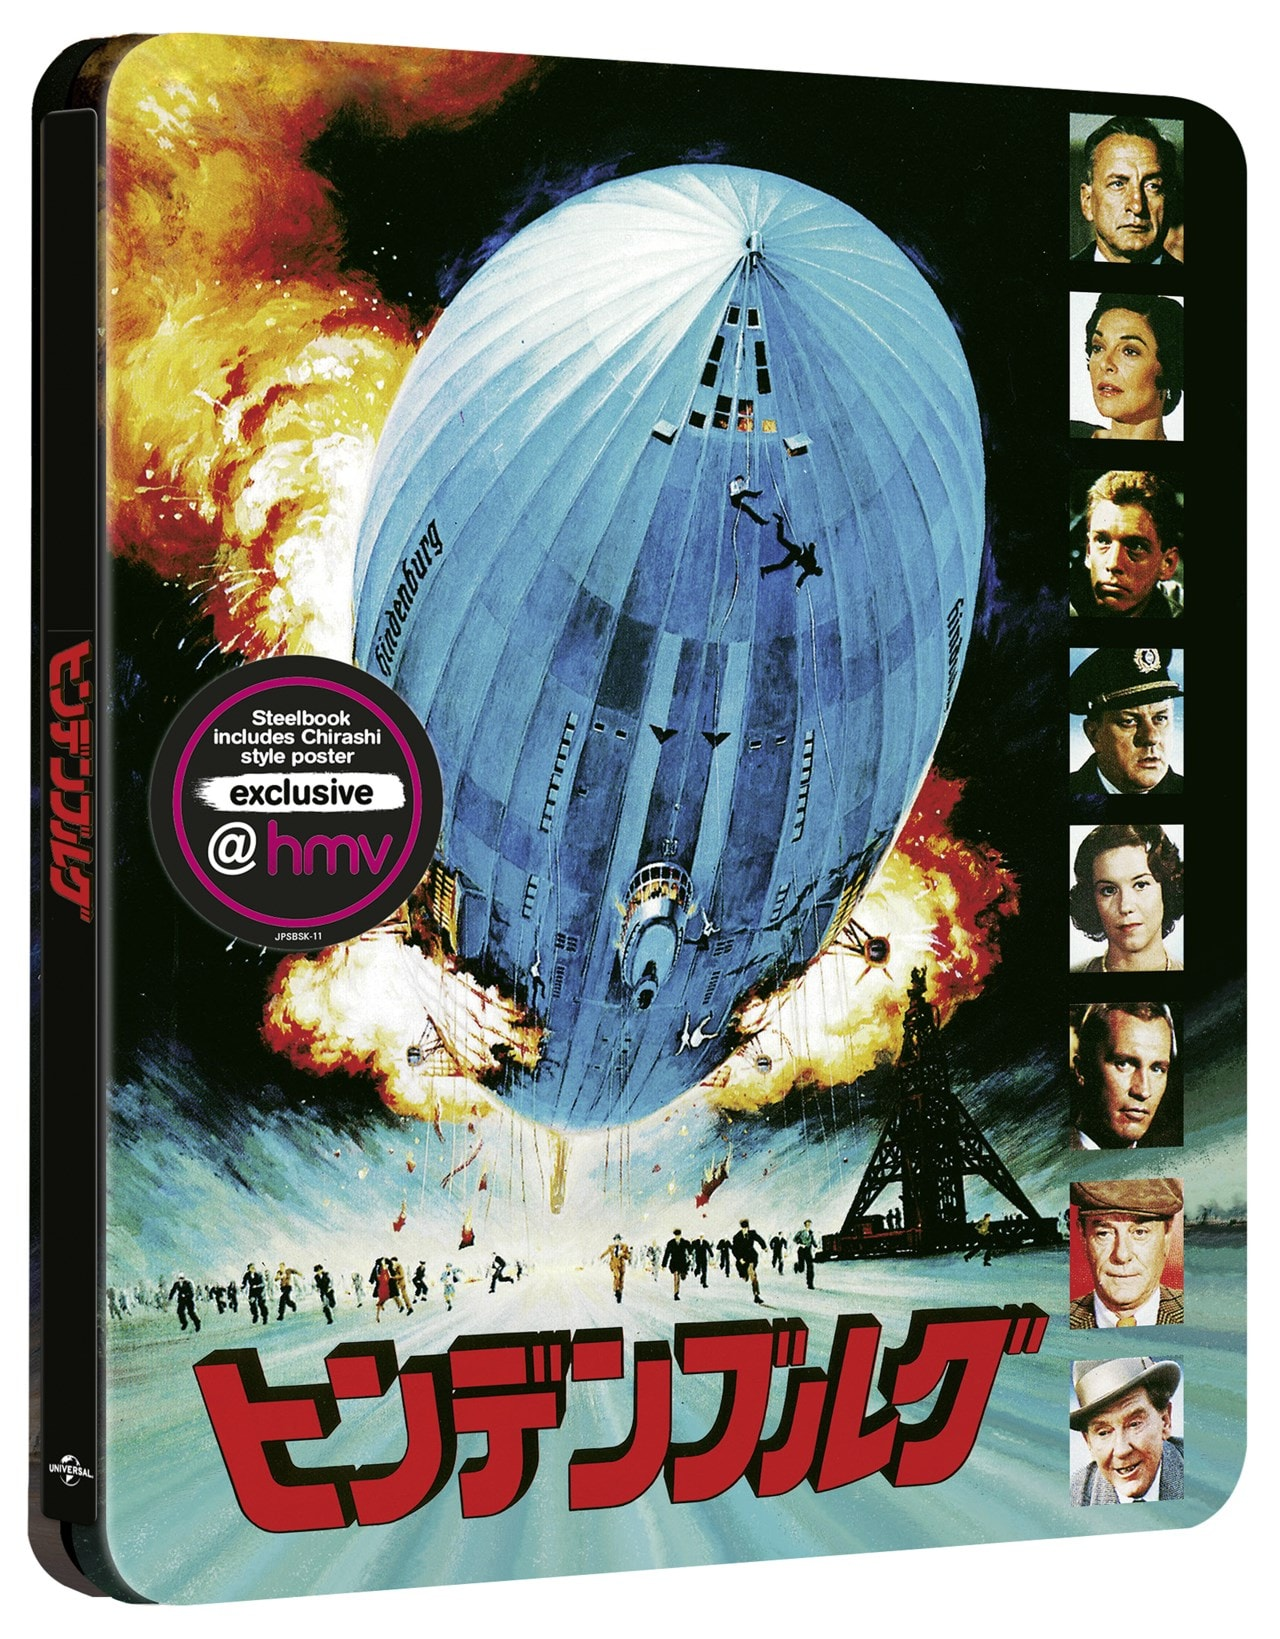 The Hindenburg (hmv Exclusive) - Japanese Artwork Series #4 Limited Edition Steelbook - 1